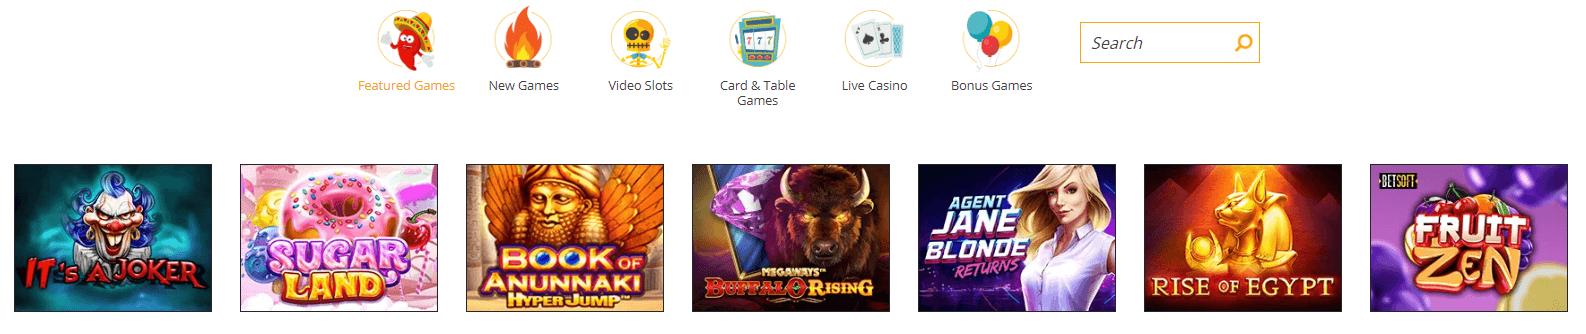 spicyspins casino games